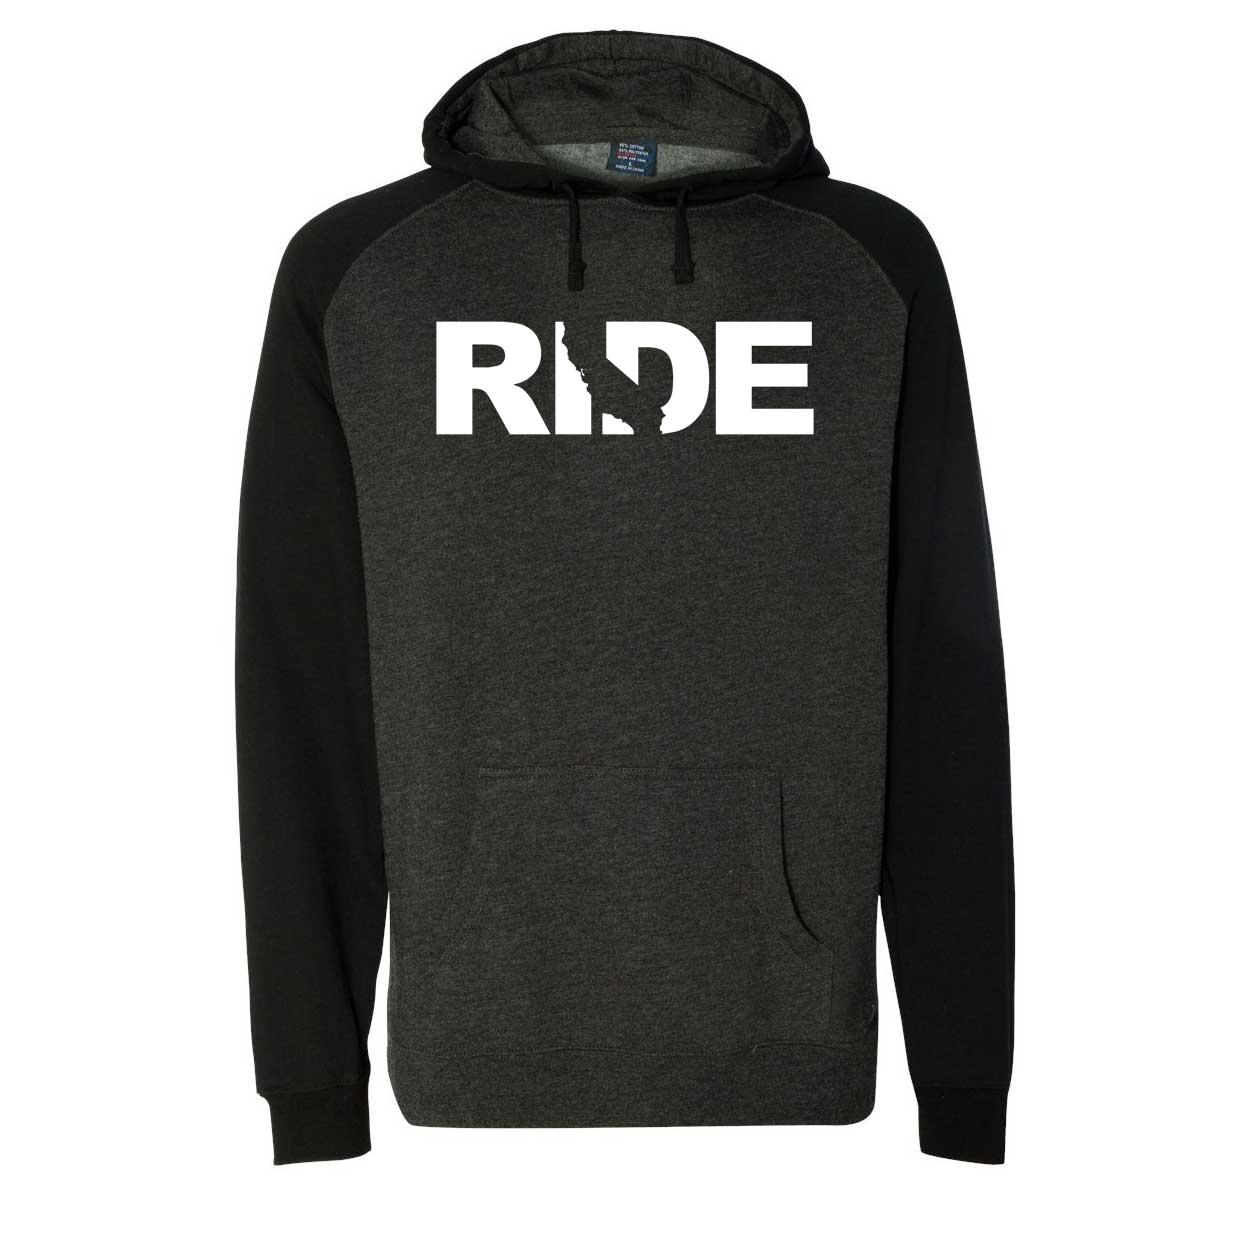 Ride California Classic Raglan Hooded Pullover Sweatshirt Charcoal/Heather Black (White Logo)